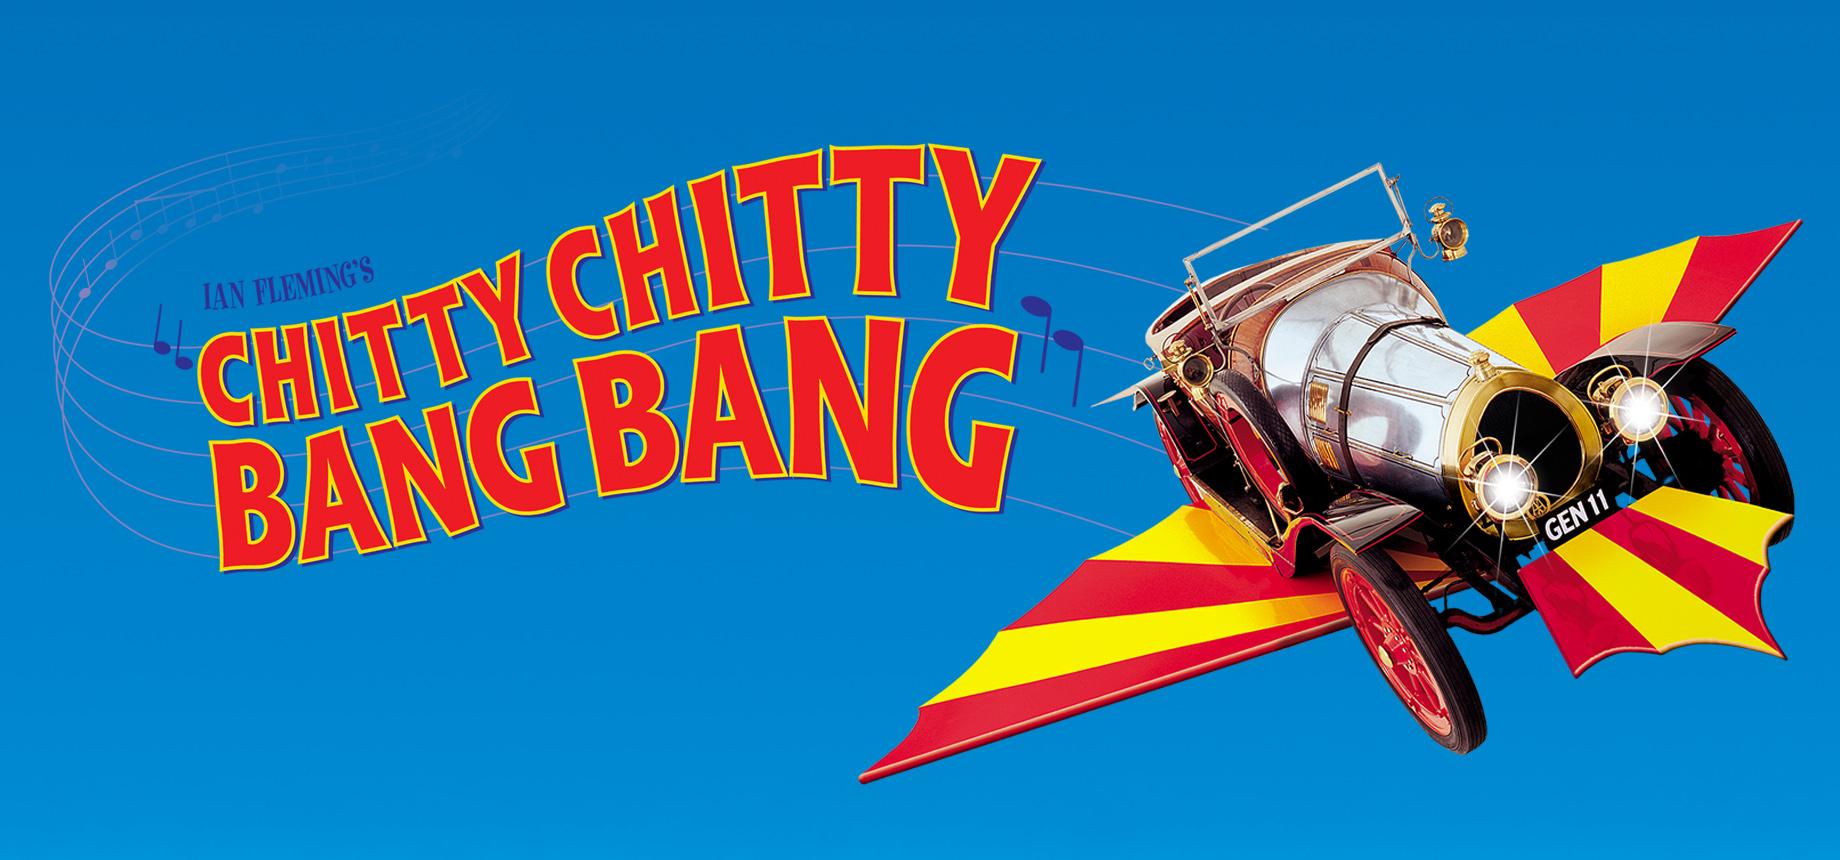 chitty chitty bang bang ost download